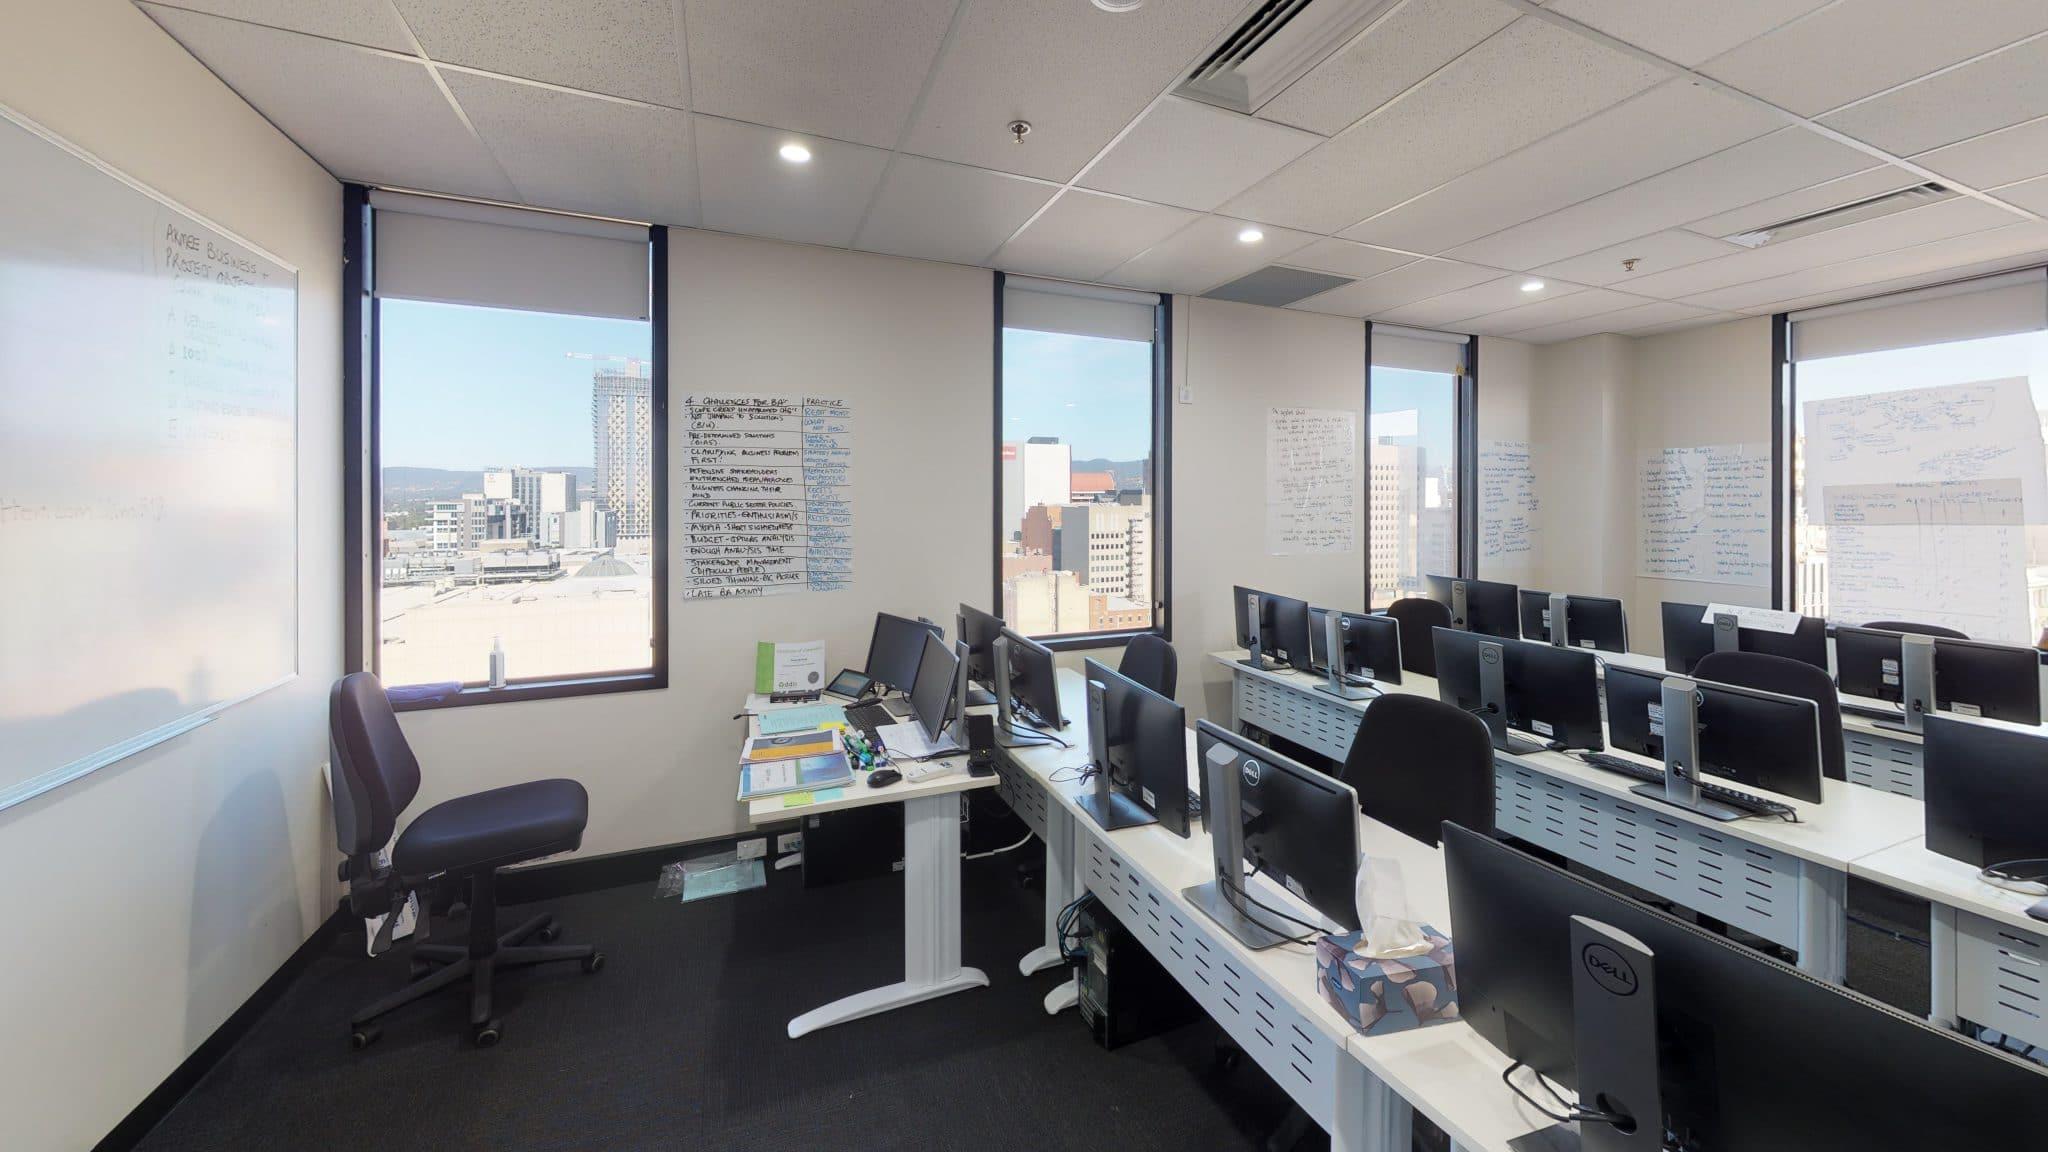 DDLs Adelaide Classroom